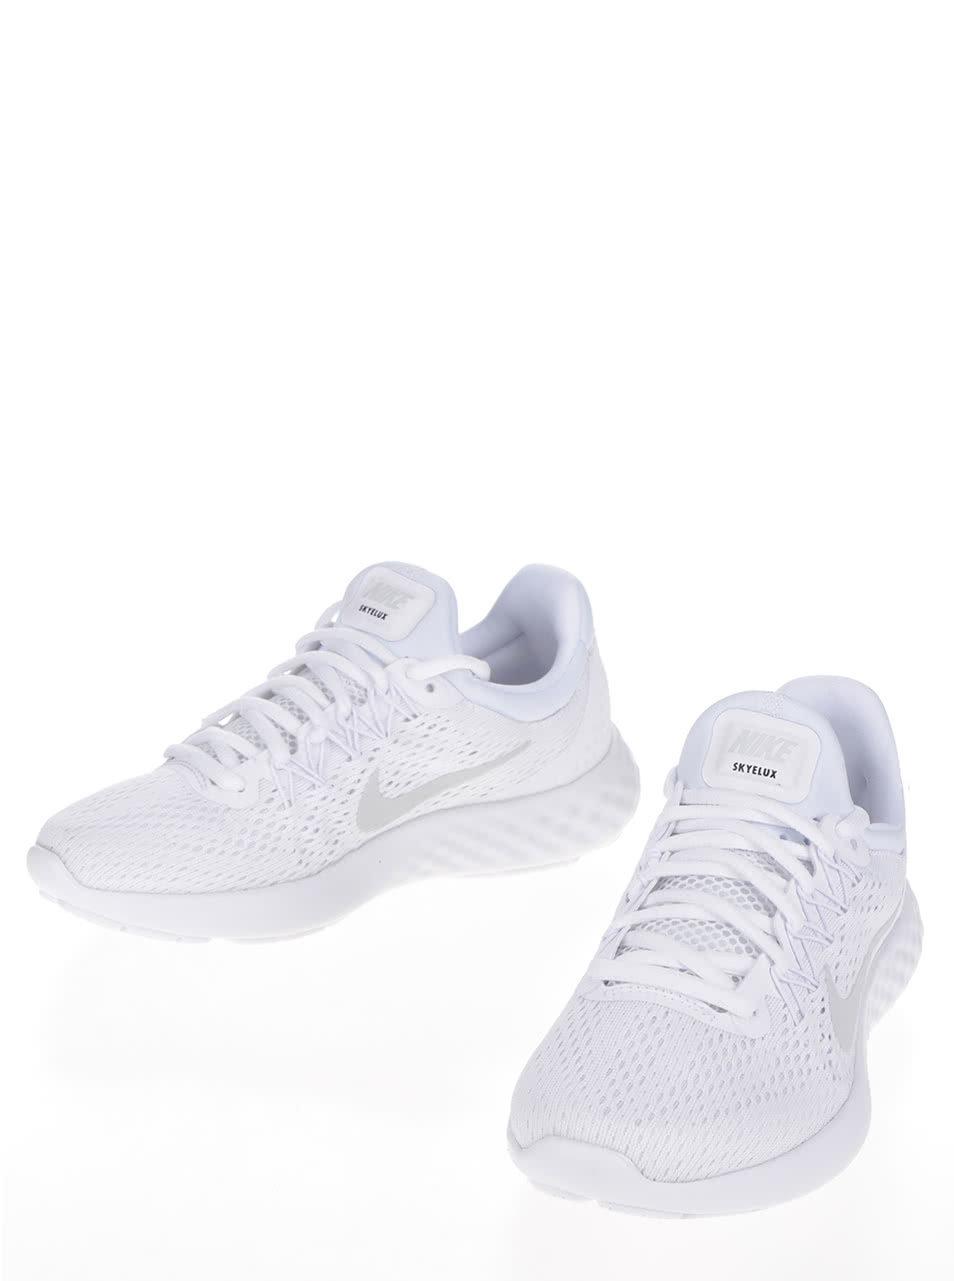 Biele dámske tenisky Nike Lunar Skyelux ... a361b078e71